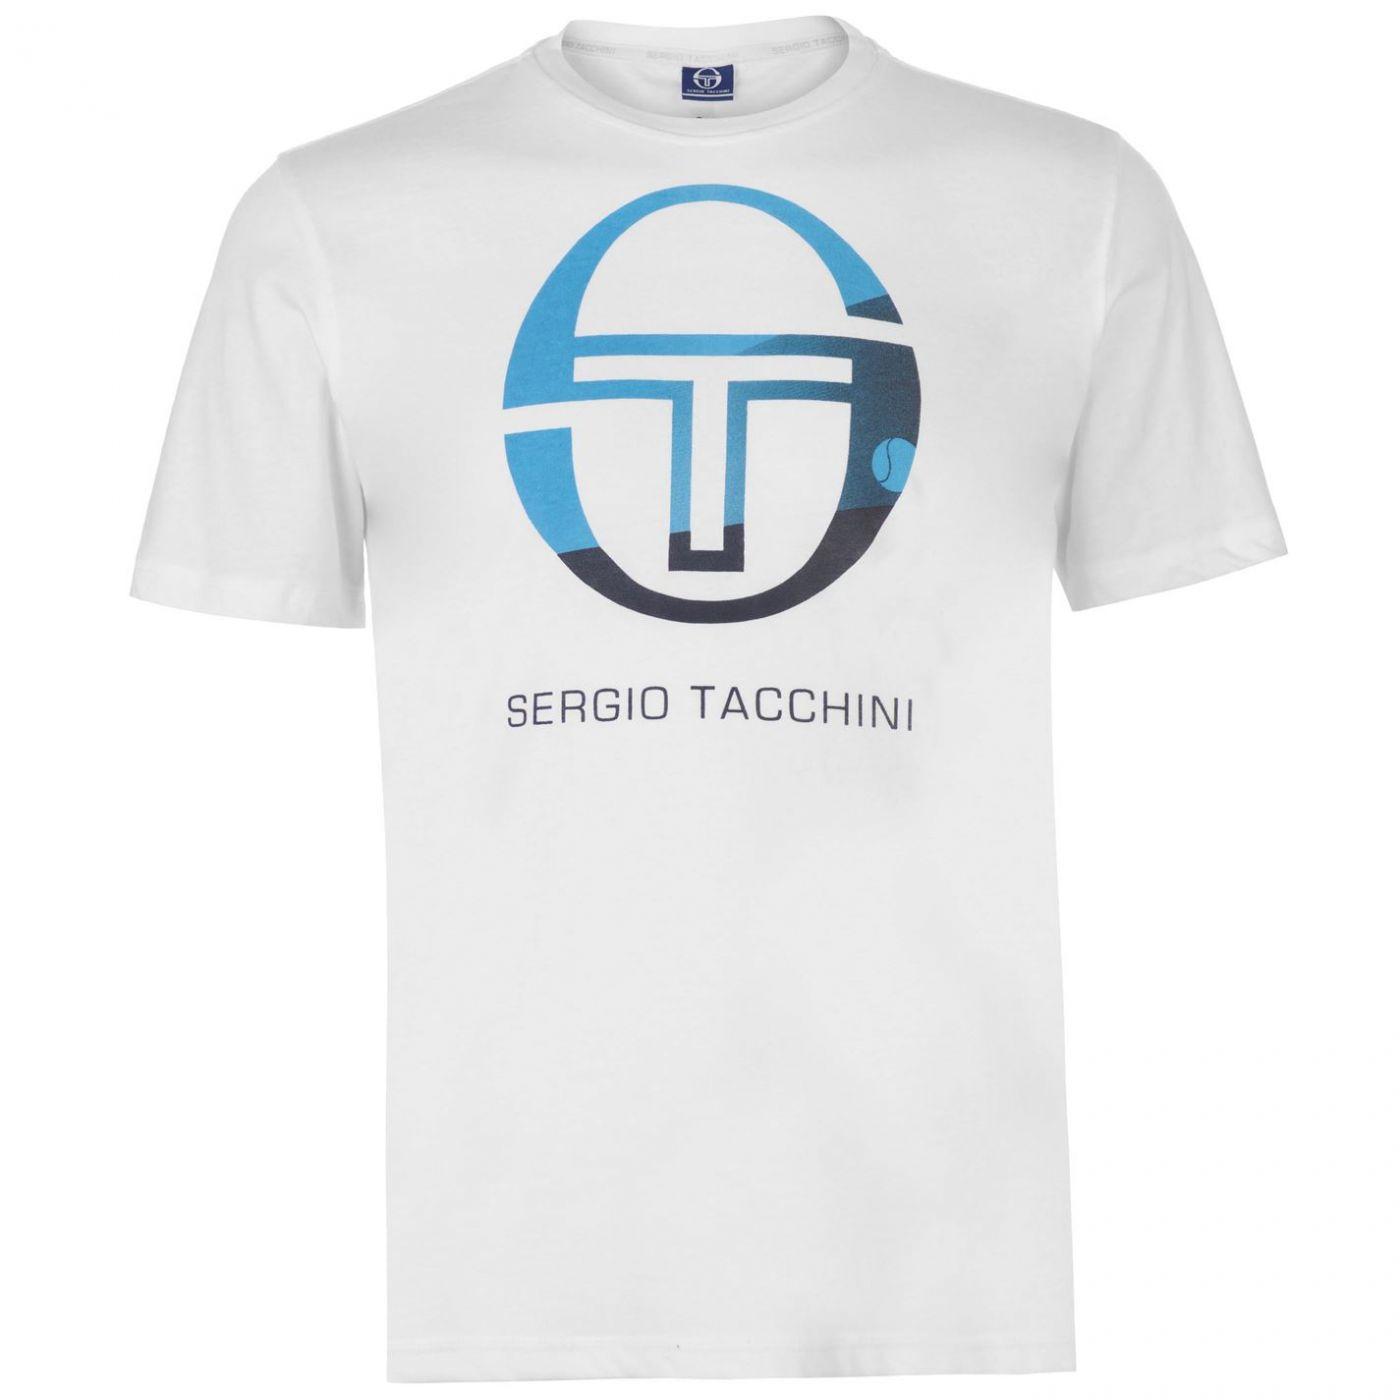 Sergio Tacchini Elbow T Shirt Mens